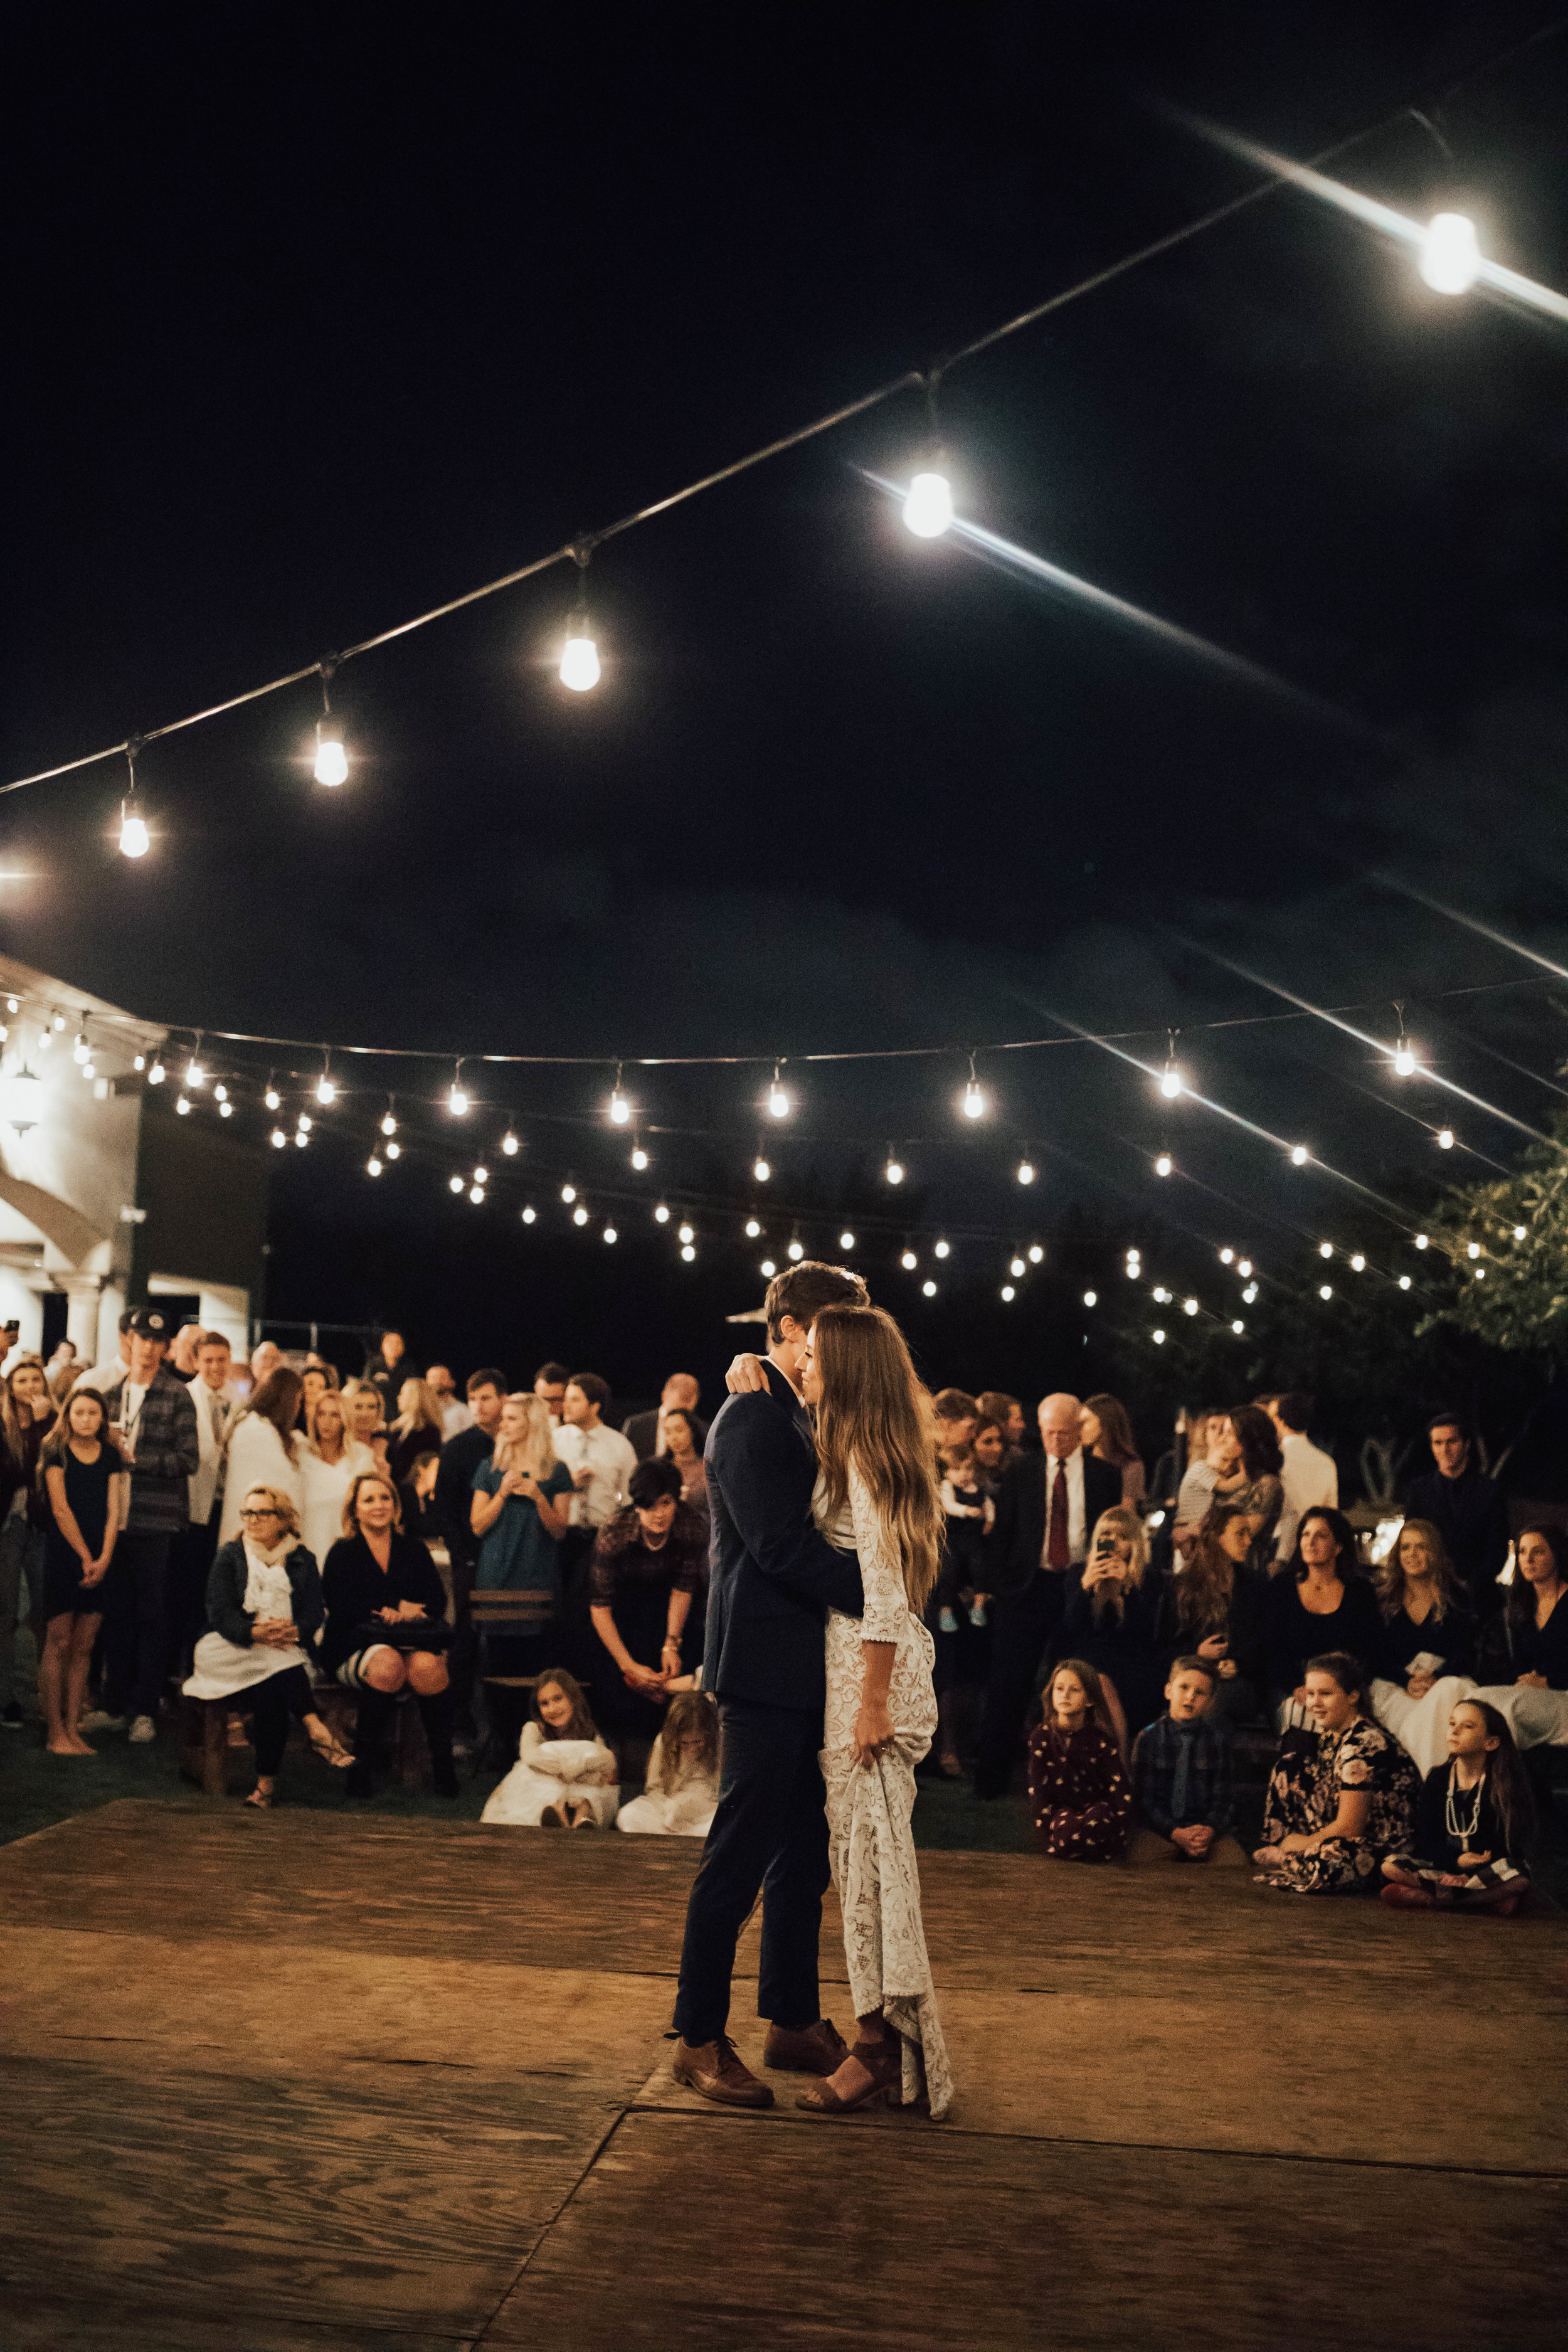 ANSLEY + BEAU WEDDING DAY